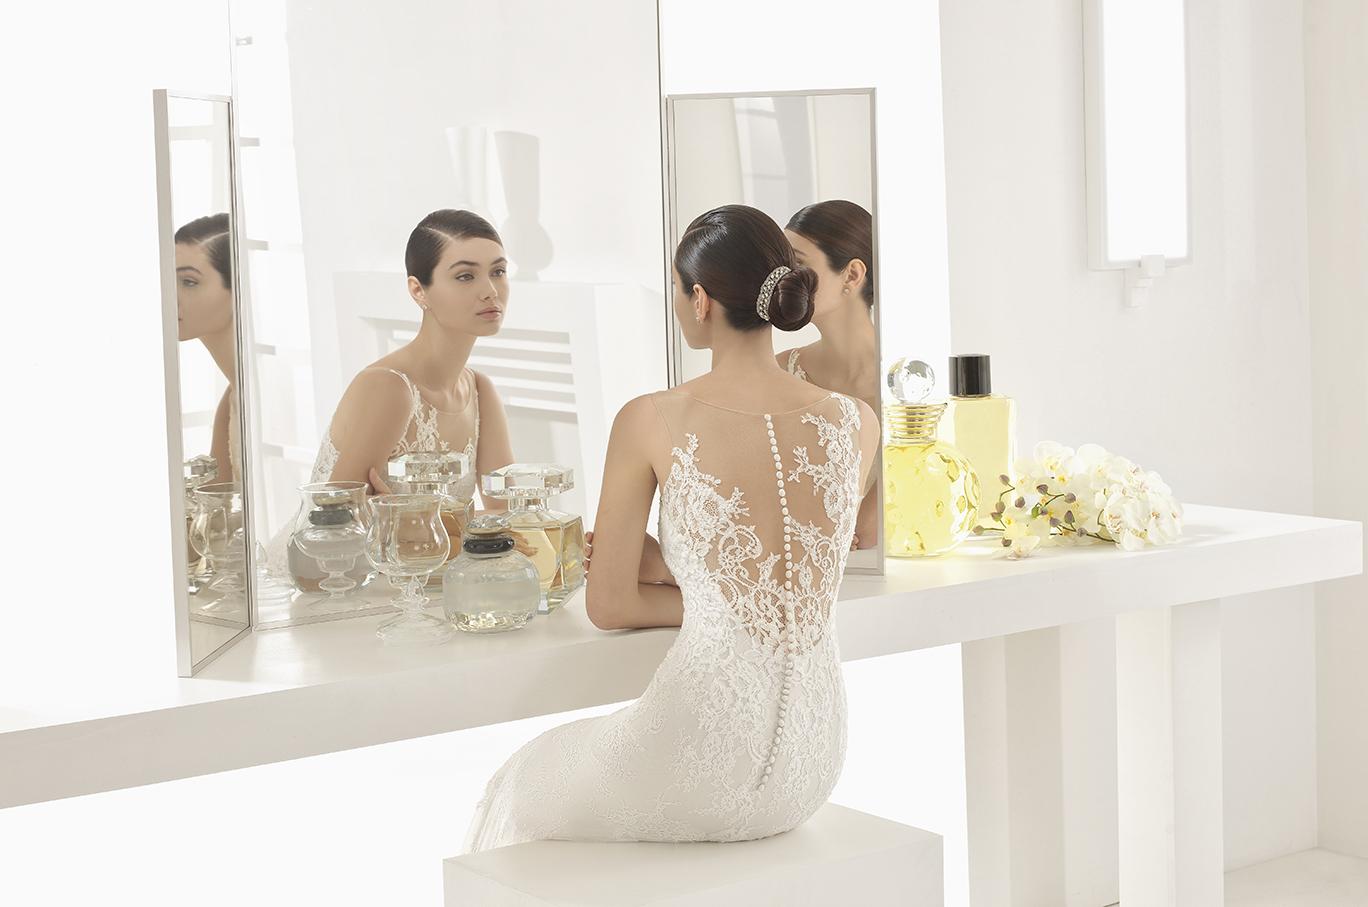 Boutique de vestidos de novia en mexicali